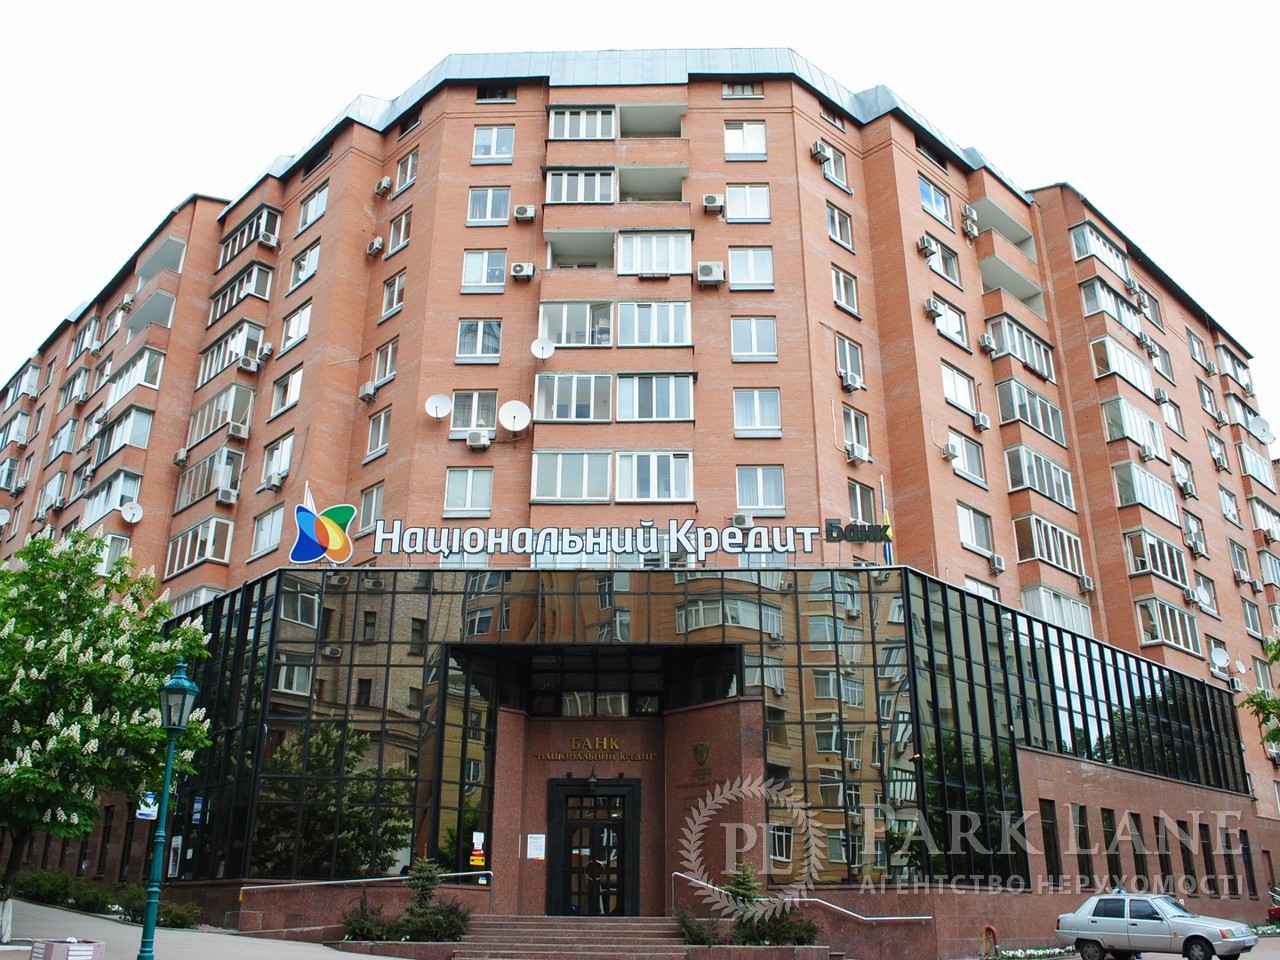 Квартира ул. Тургеневская, 52/58, Киев, P-2463 - Фото 1